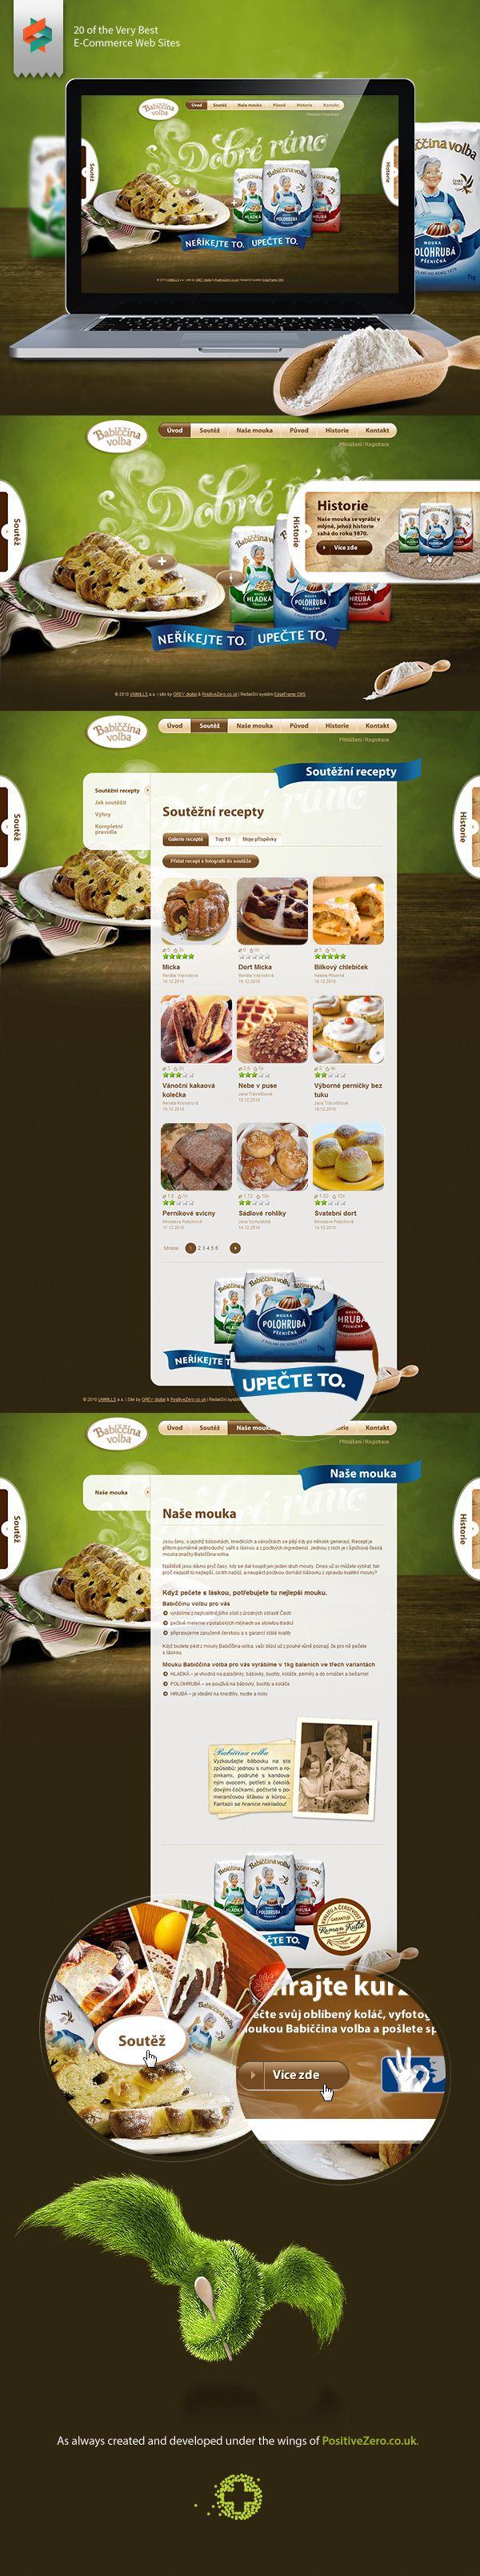 Babiccina Volba by PositiveZero.co.uk , via Behance